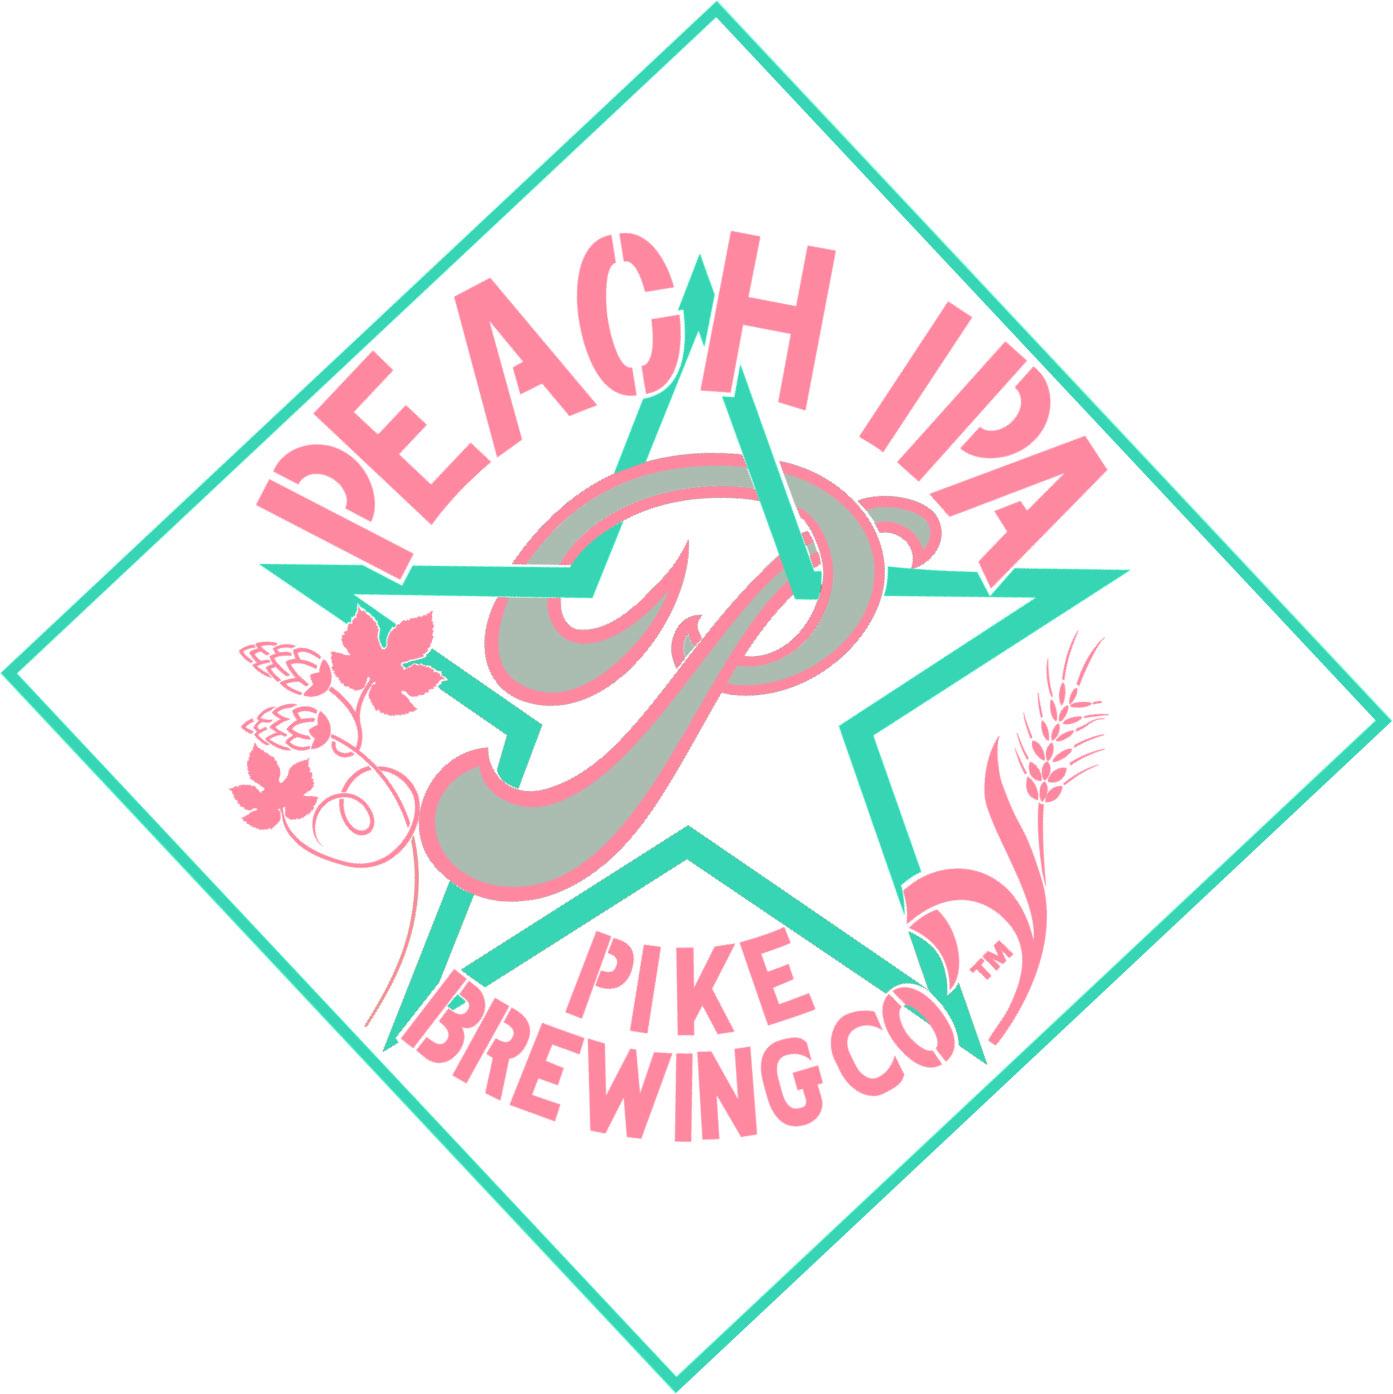 Pike Peach IPA logo